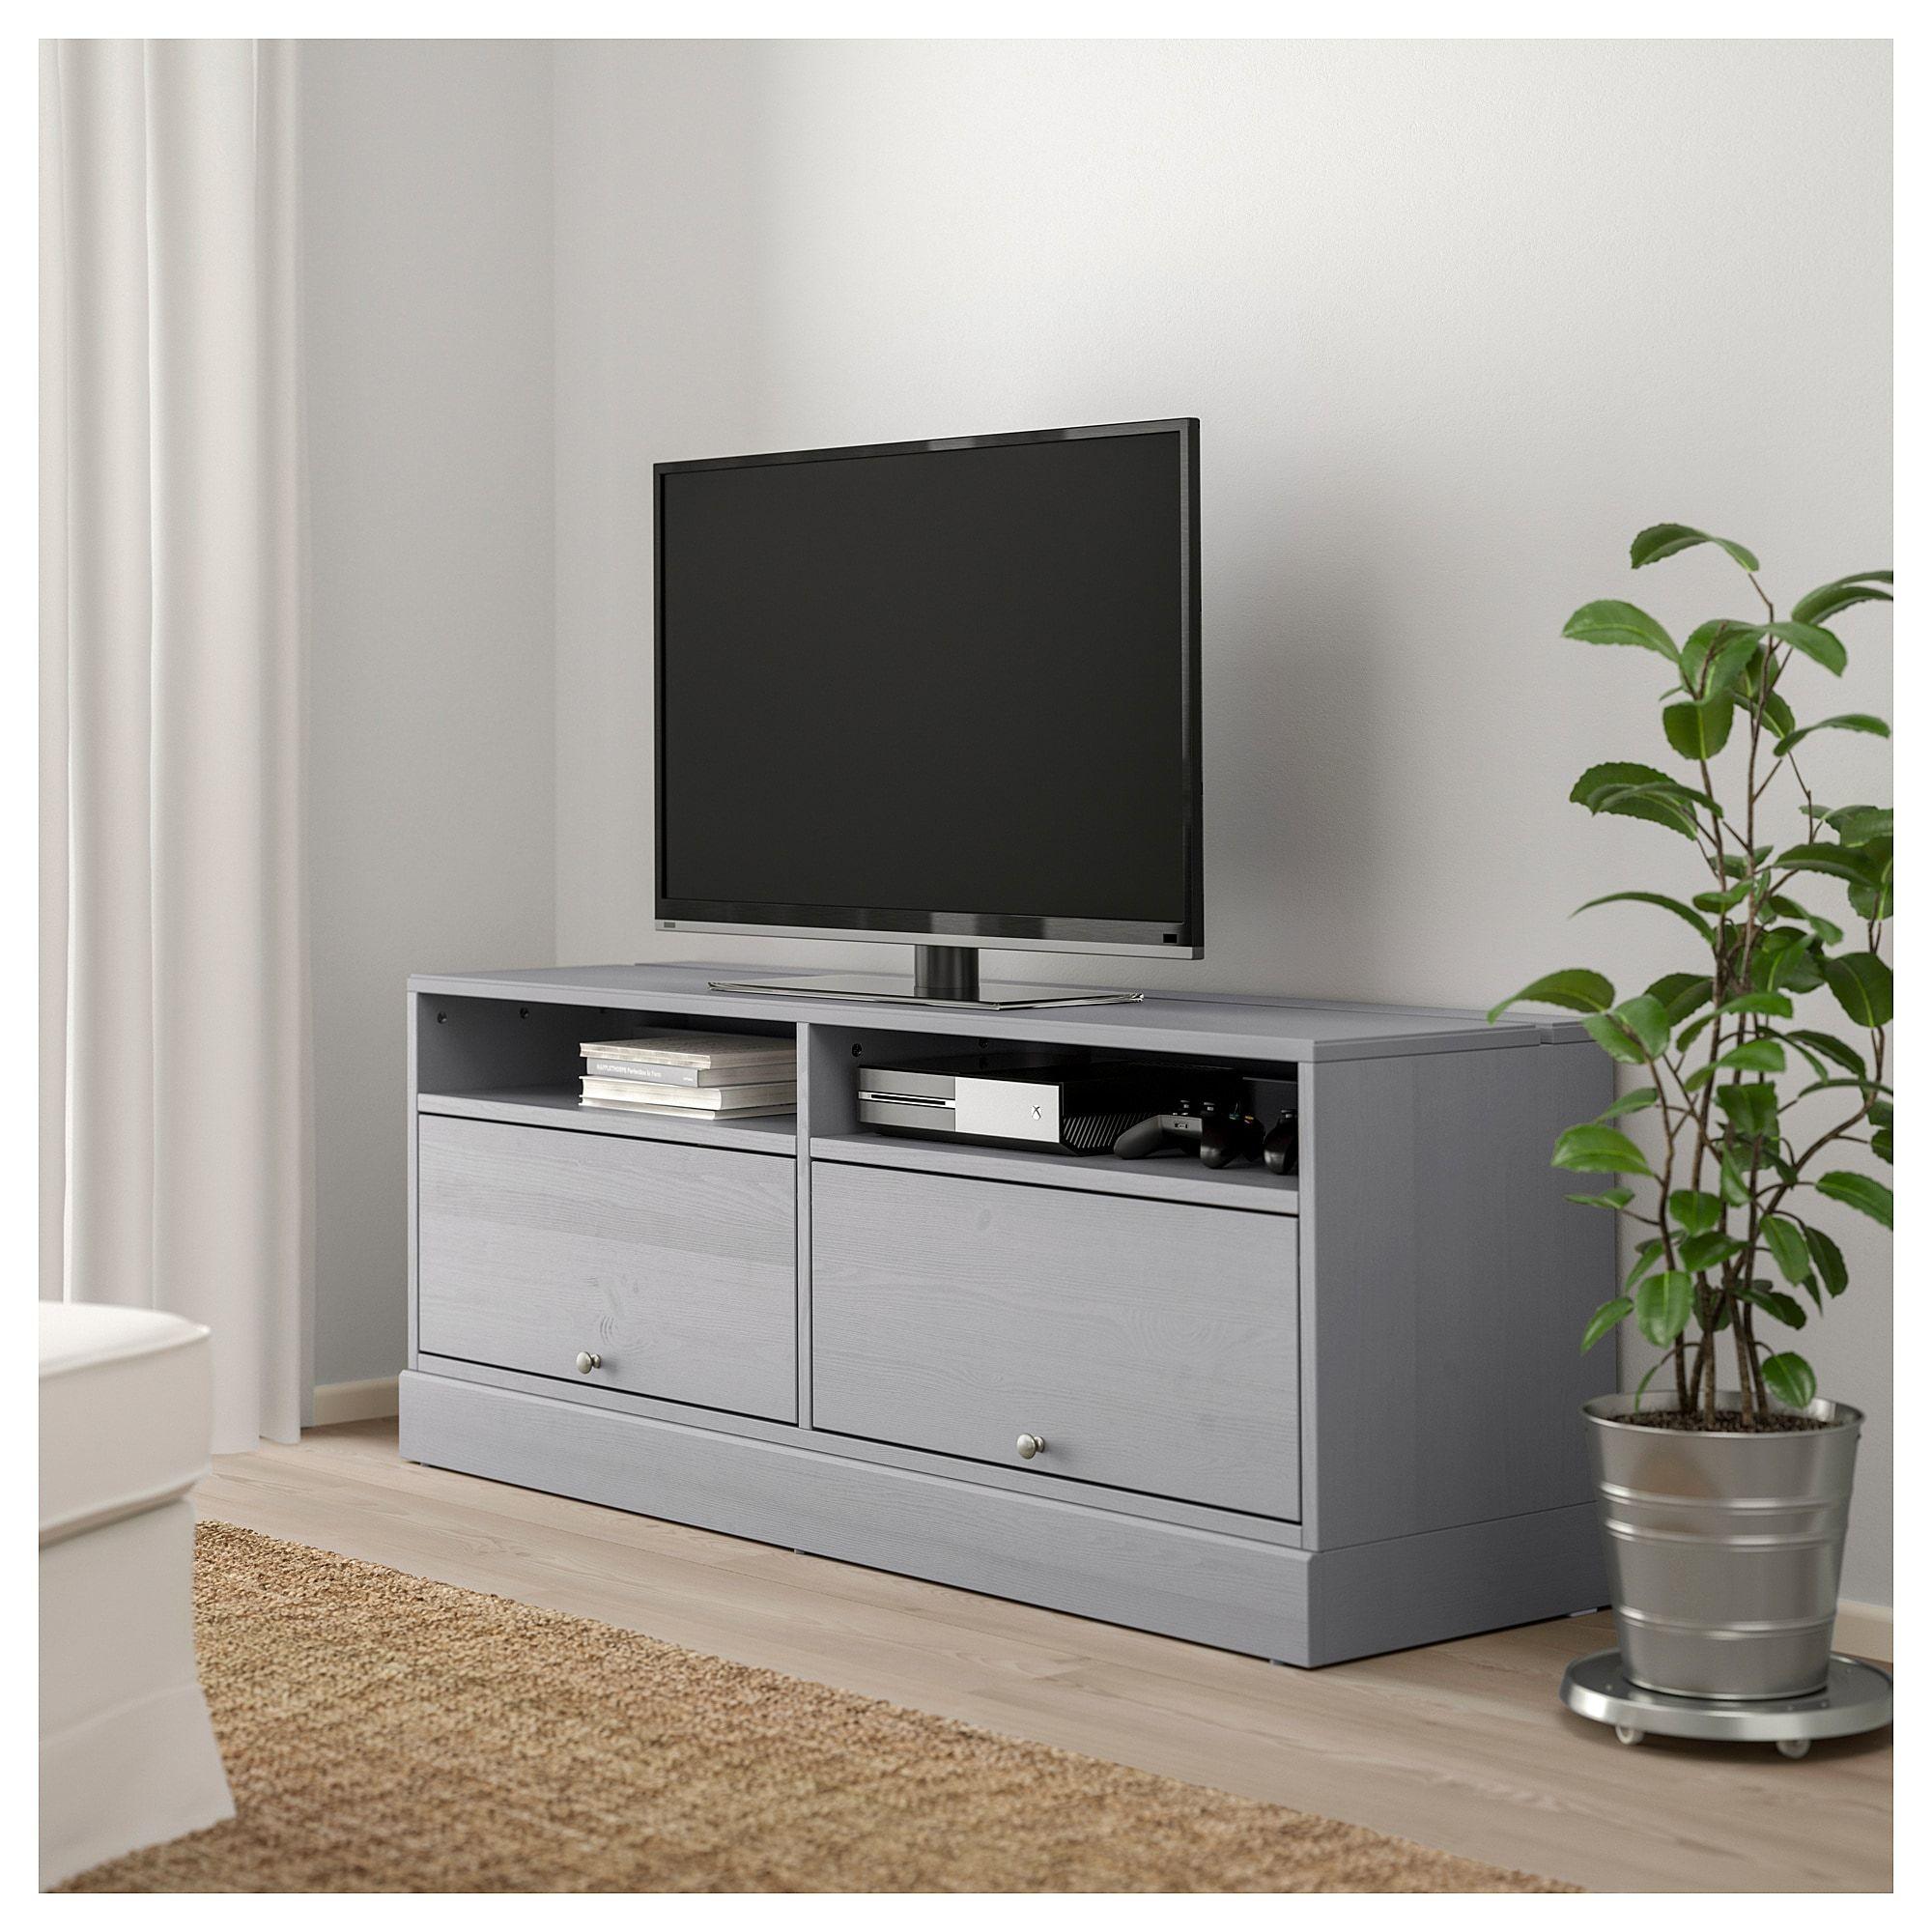 Havsta Tv Bank Mit Sockel Grau Ikea Osterreich Tv Mobel Tv